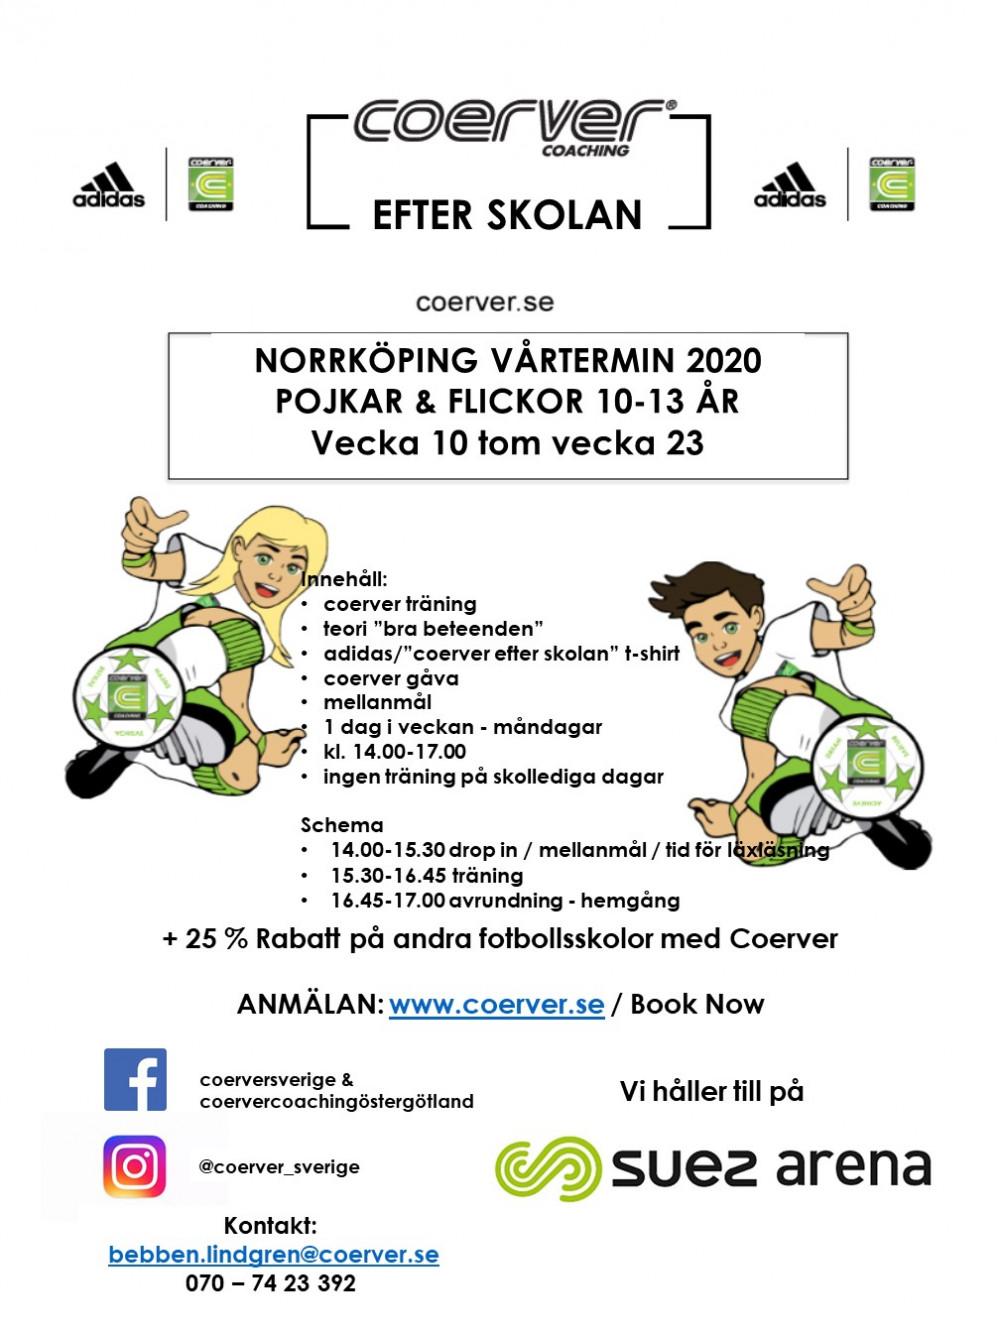 Coerver Efter Skolan Norrköping Vår 2020